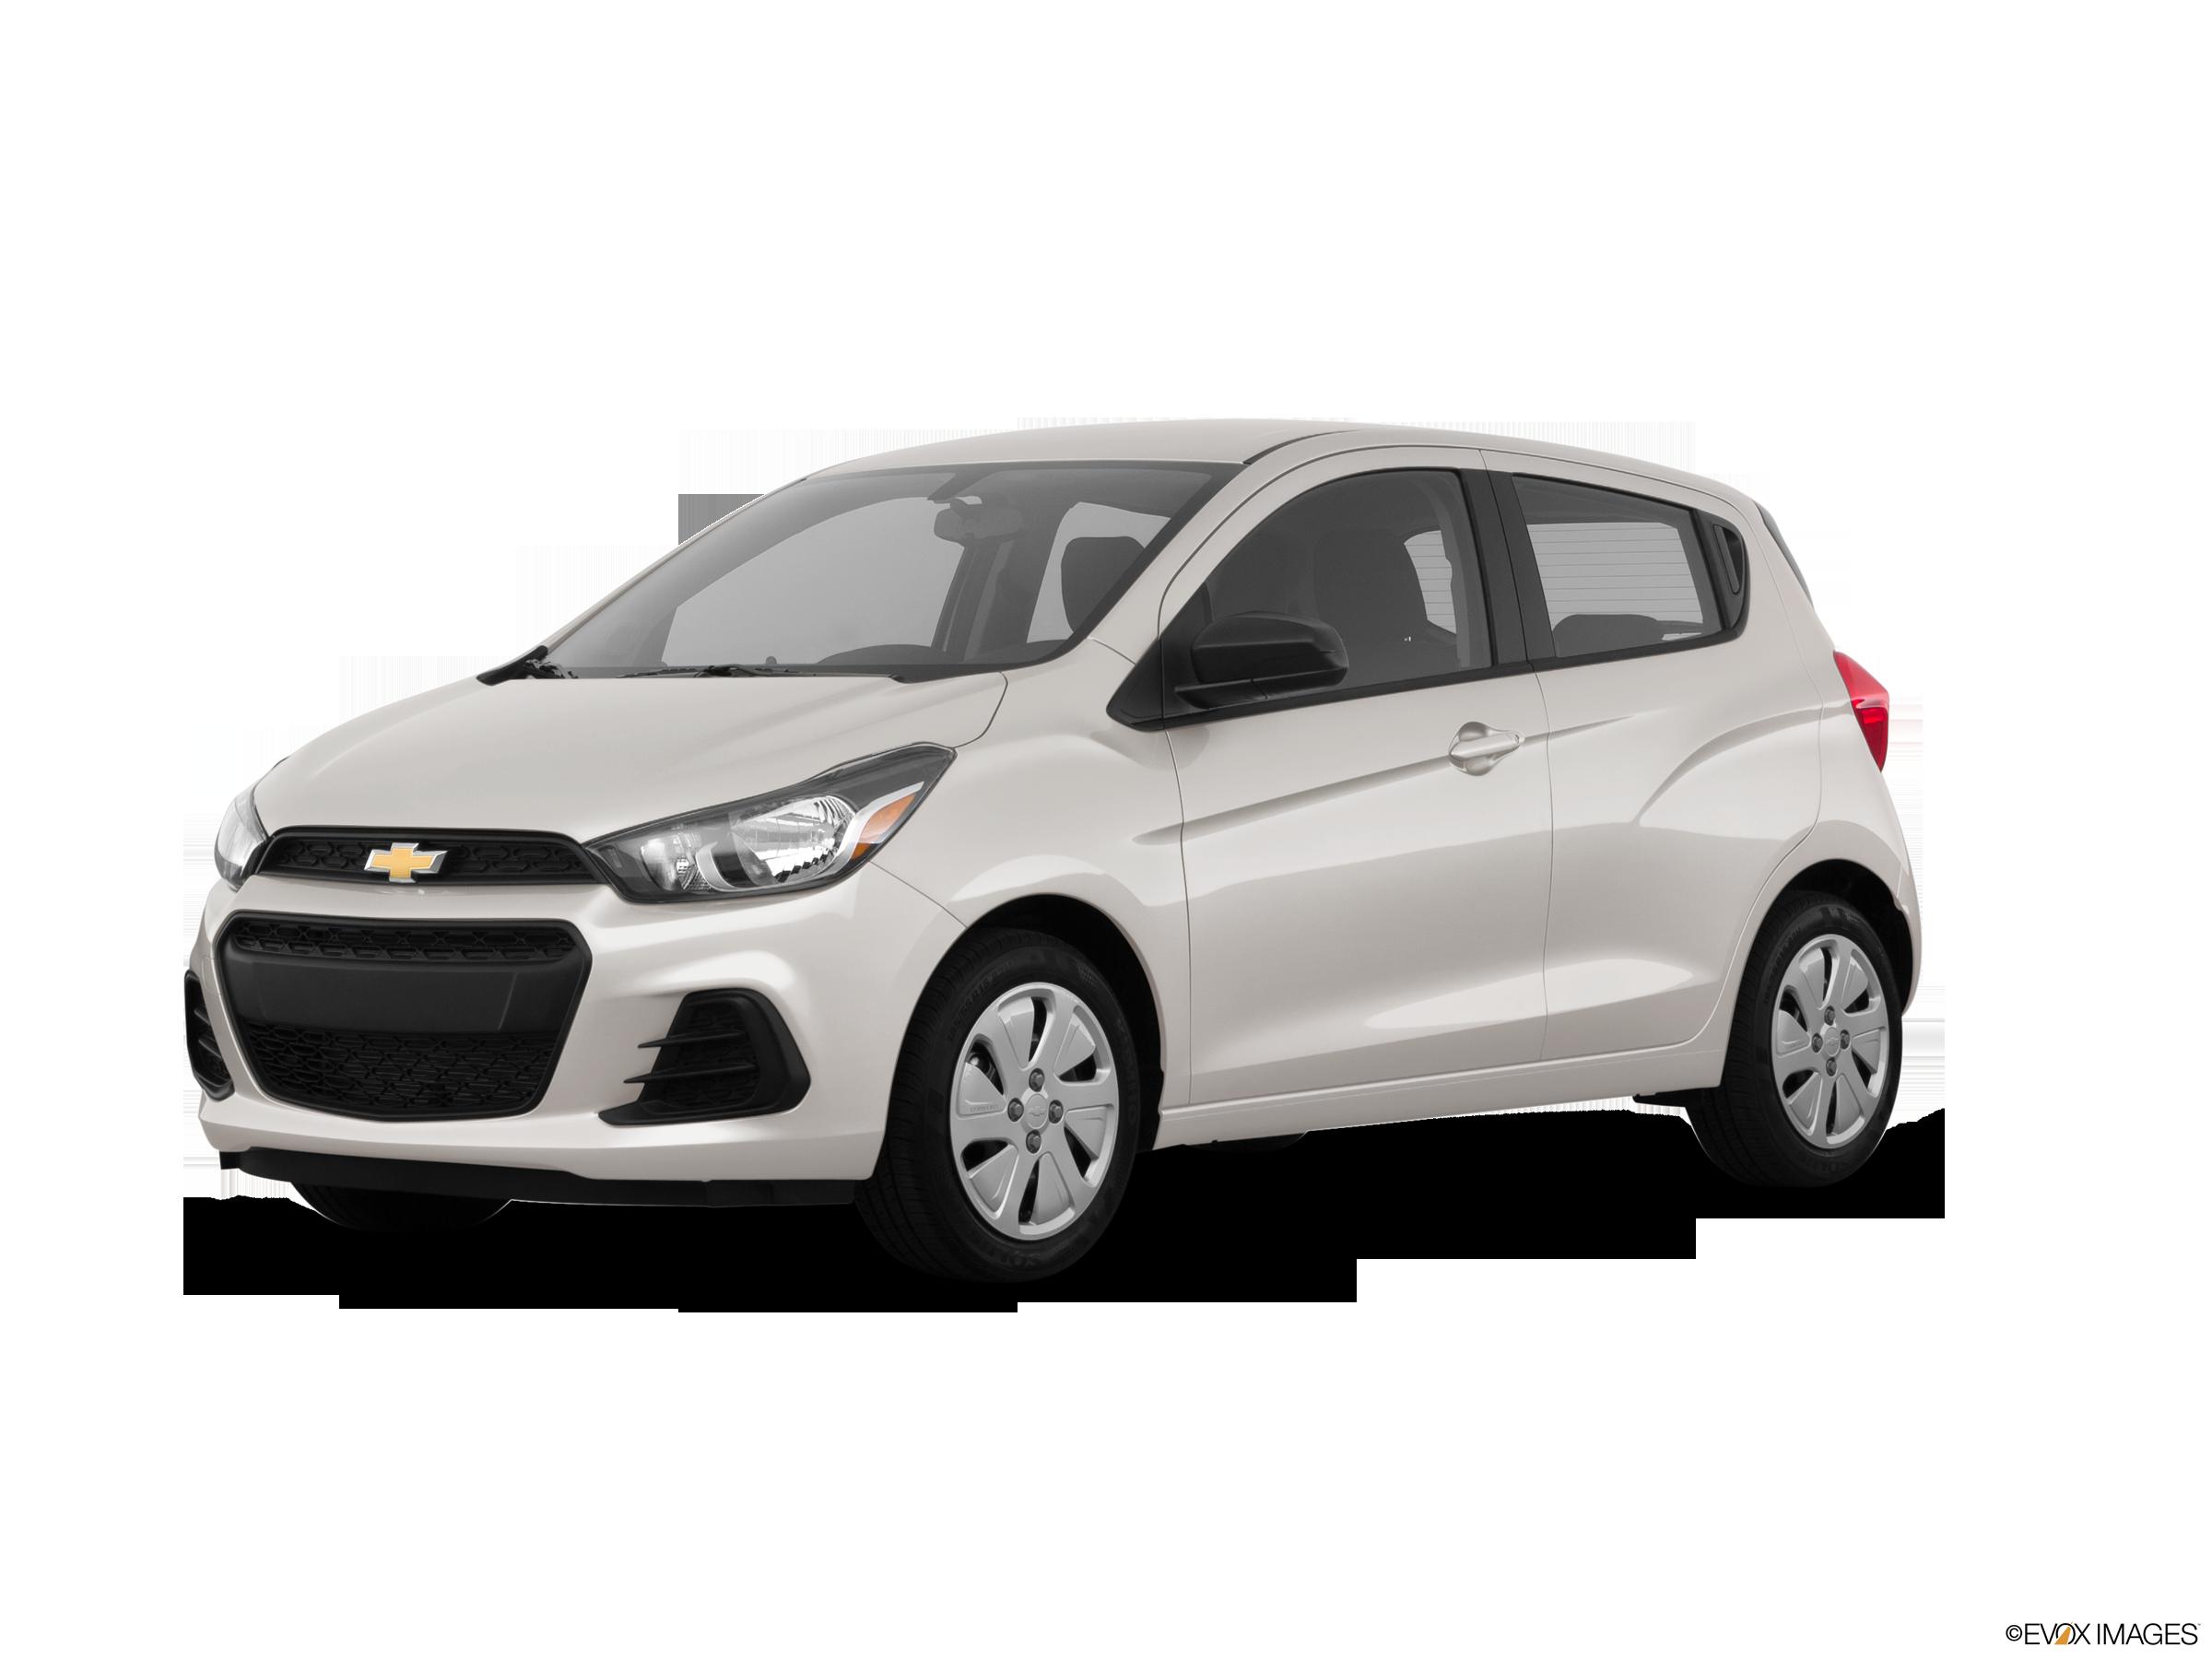 Kekurangan Chevrolet Spark 2018 Spesifikasi